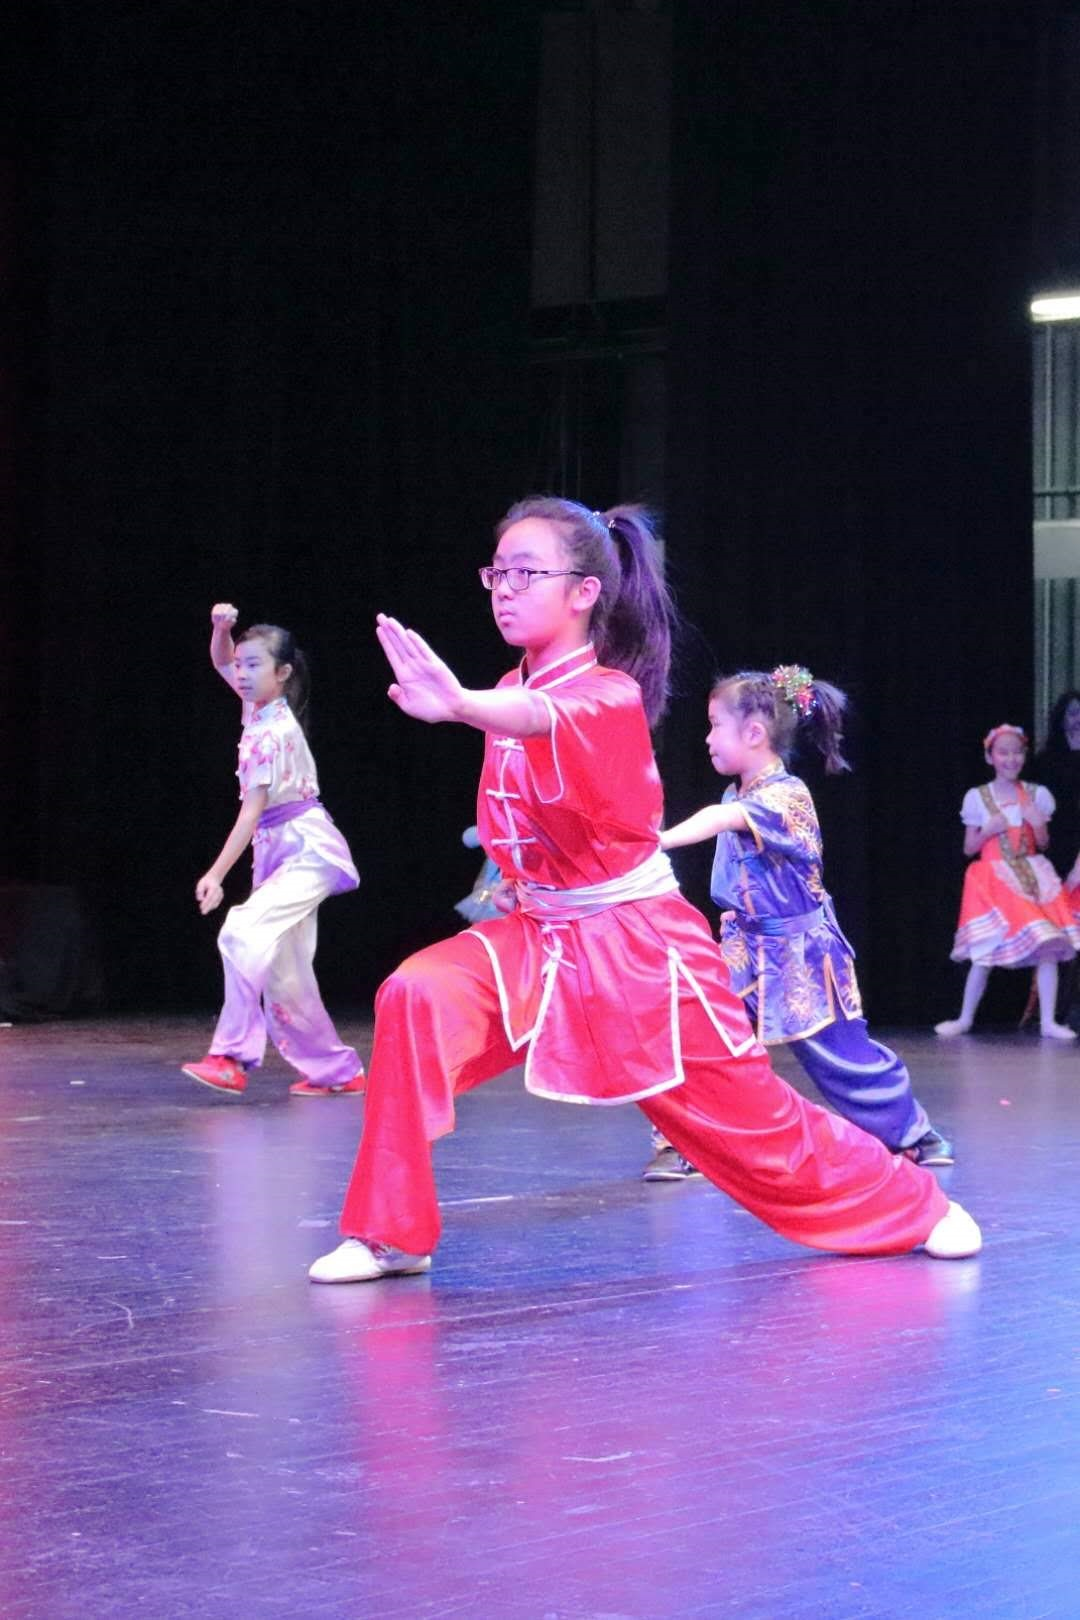 wayland-li-wushu-children-spring-fesitval-toronto-canada-2019-22.jpg